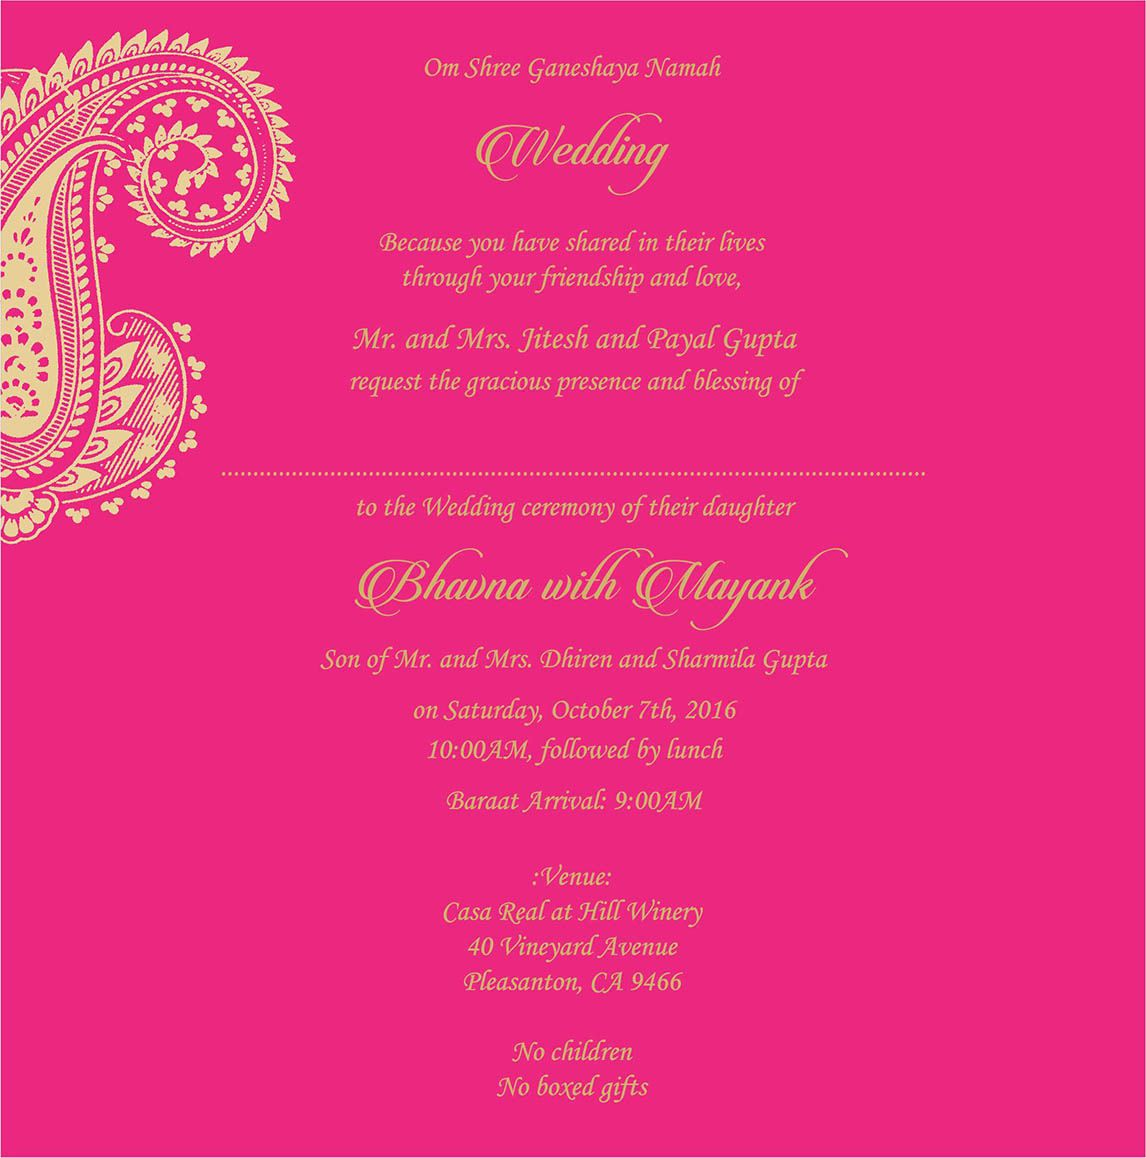 Wedding Invitation Wording For Hindu Wedding Ceremony in ...